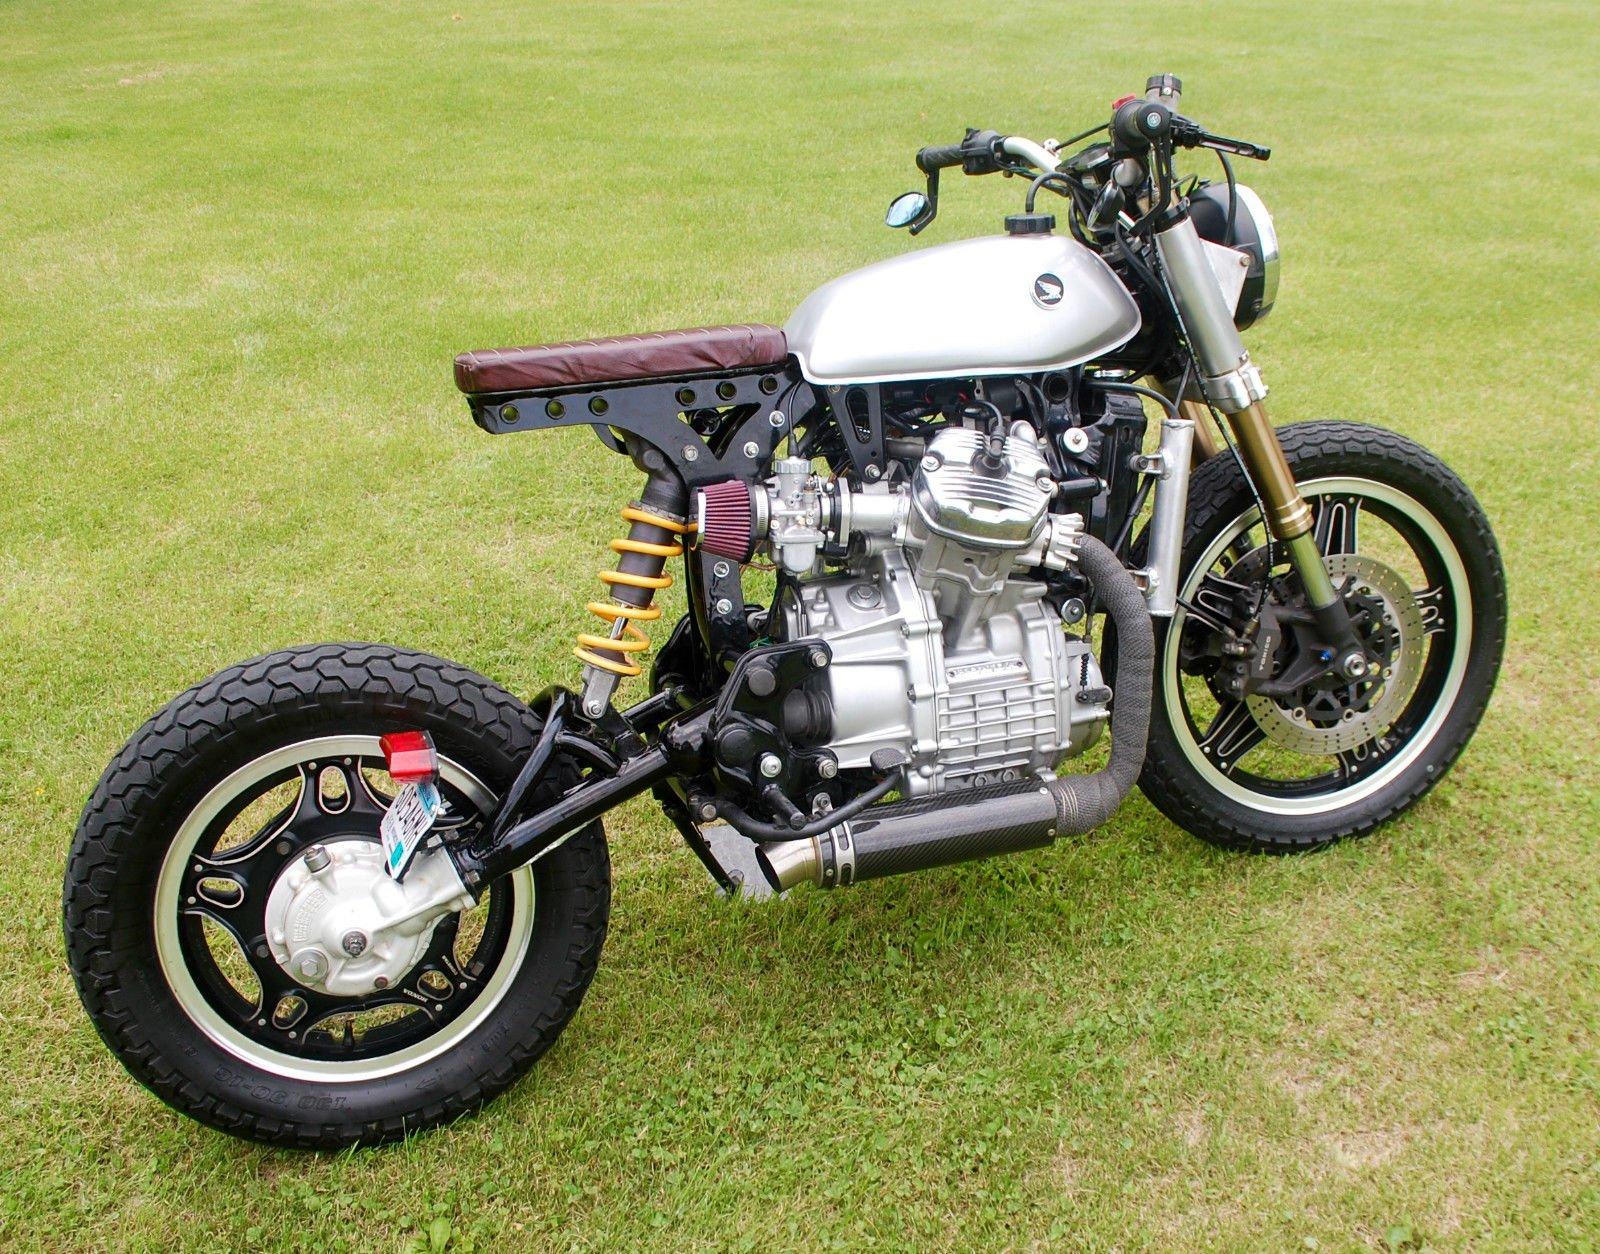 Honda twin mono bobber cafe racer streefighter motorcycle custom motorbike bike wallpaper wallpaperup jpg 1600x1254 1979